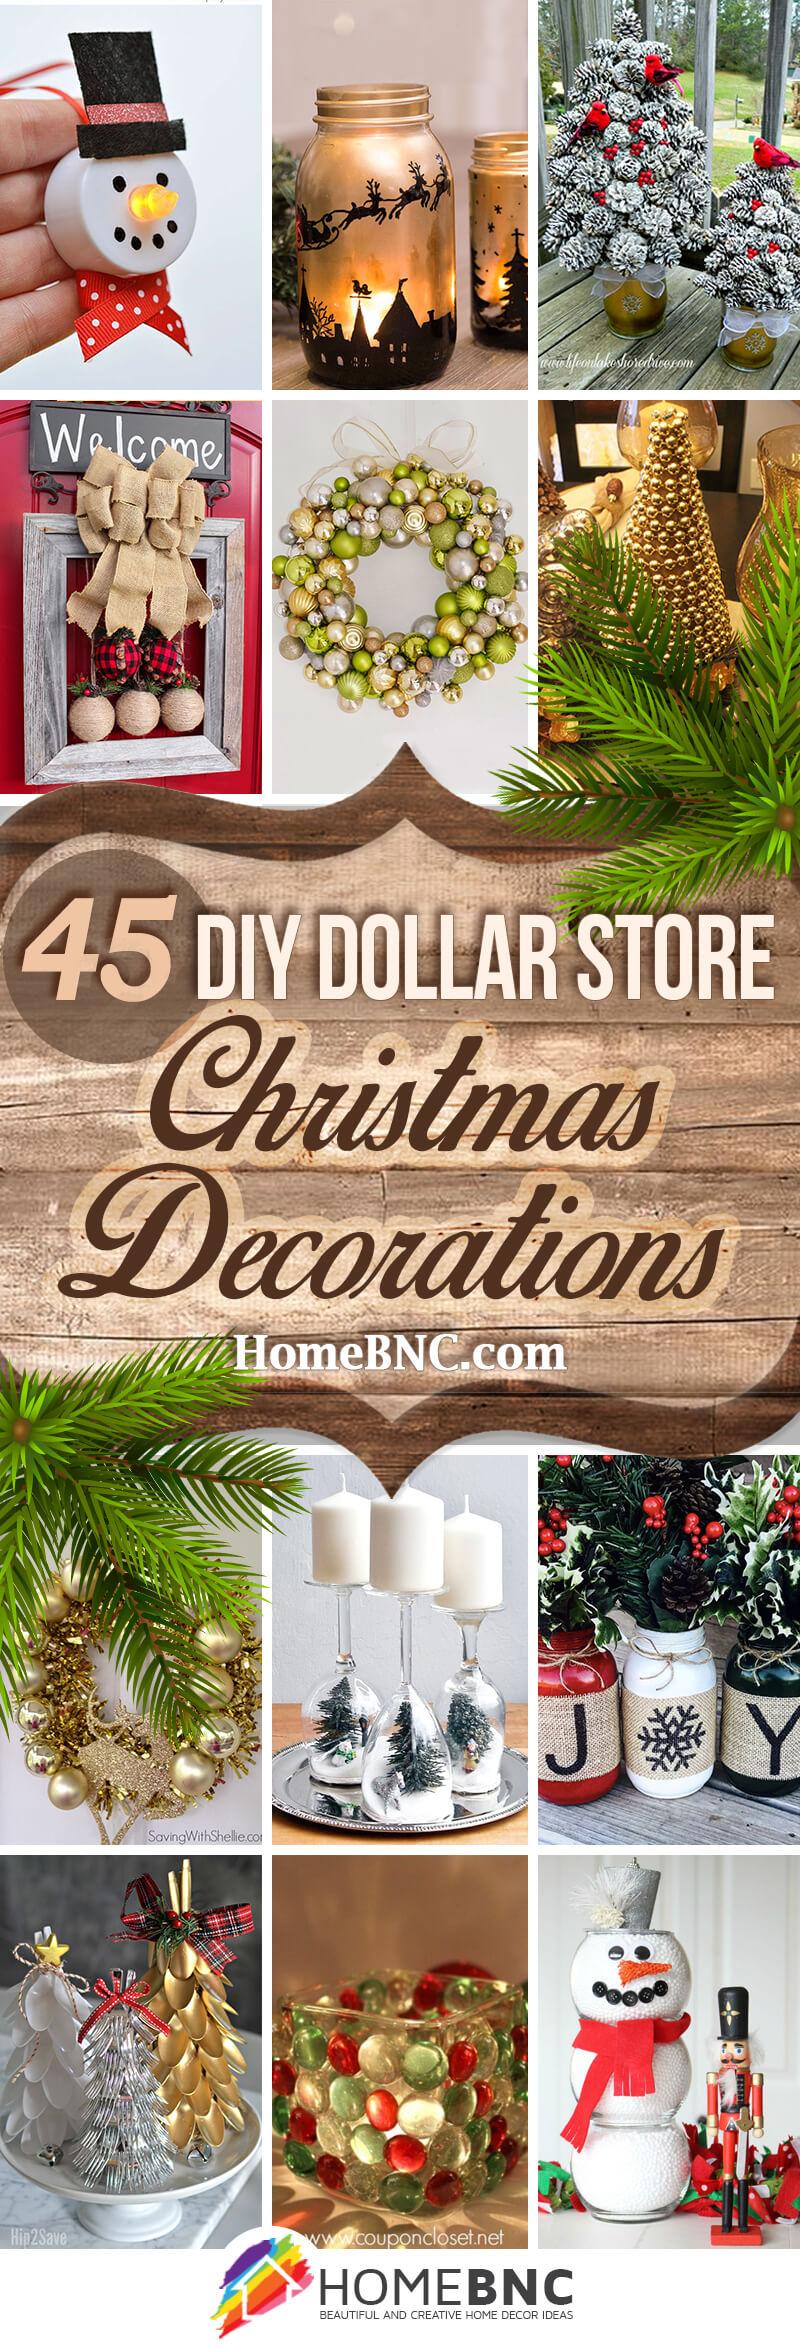 45 Best Diy Dollar Store Christmas Decor Craft Ideas For 2020